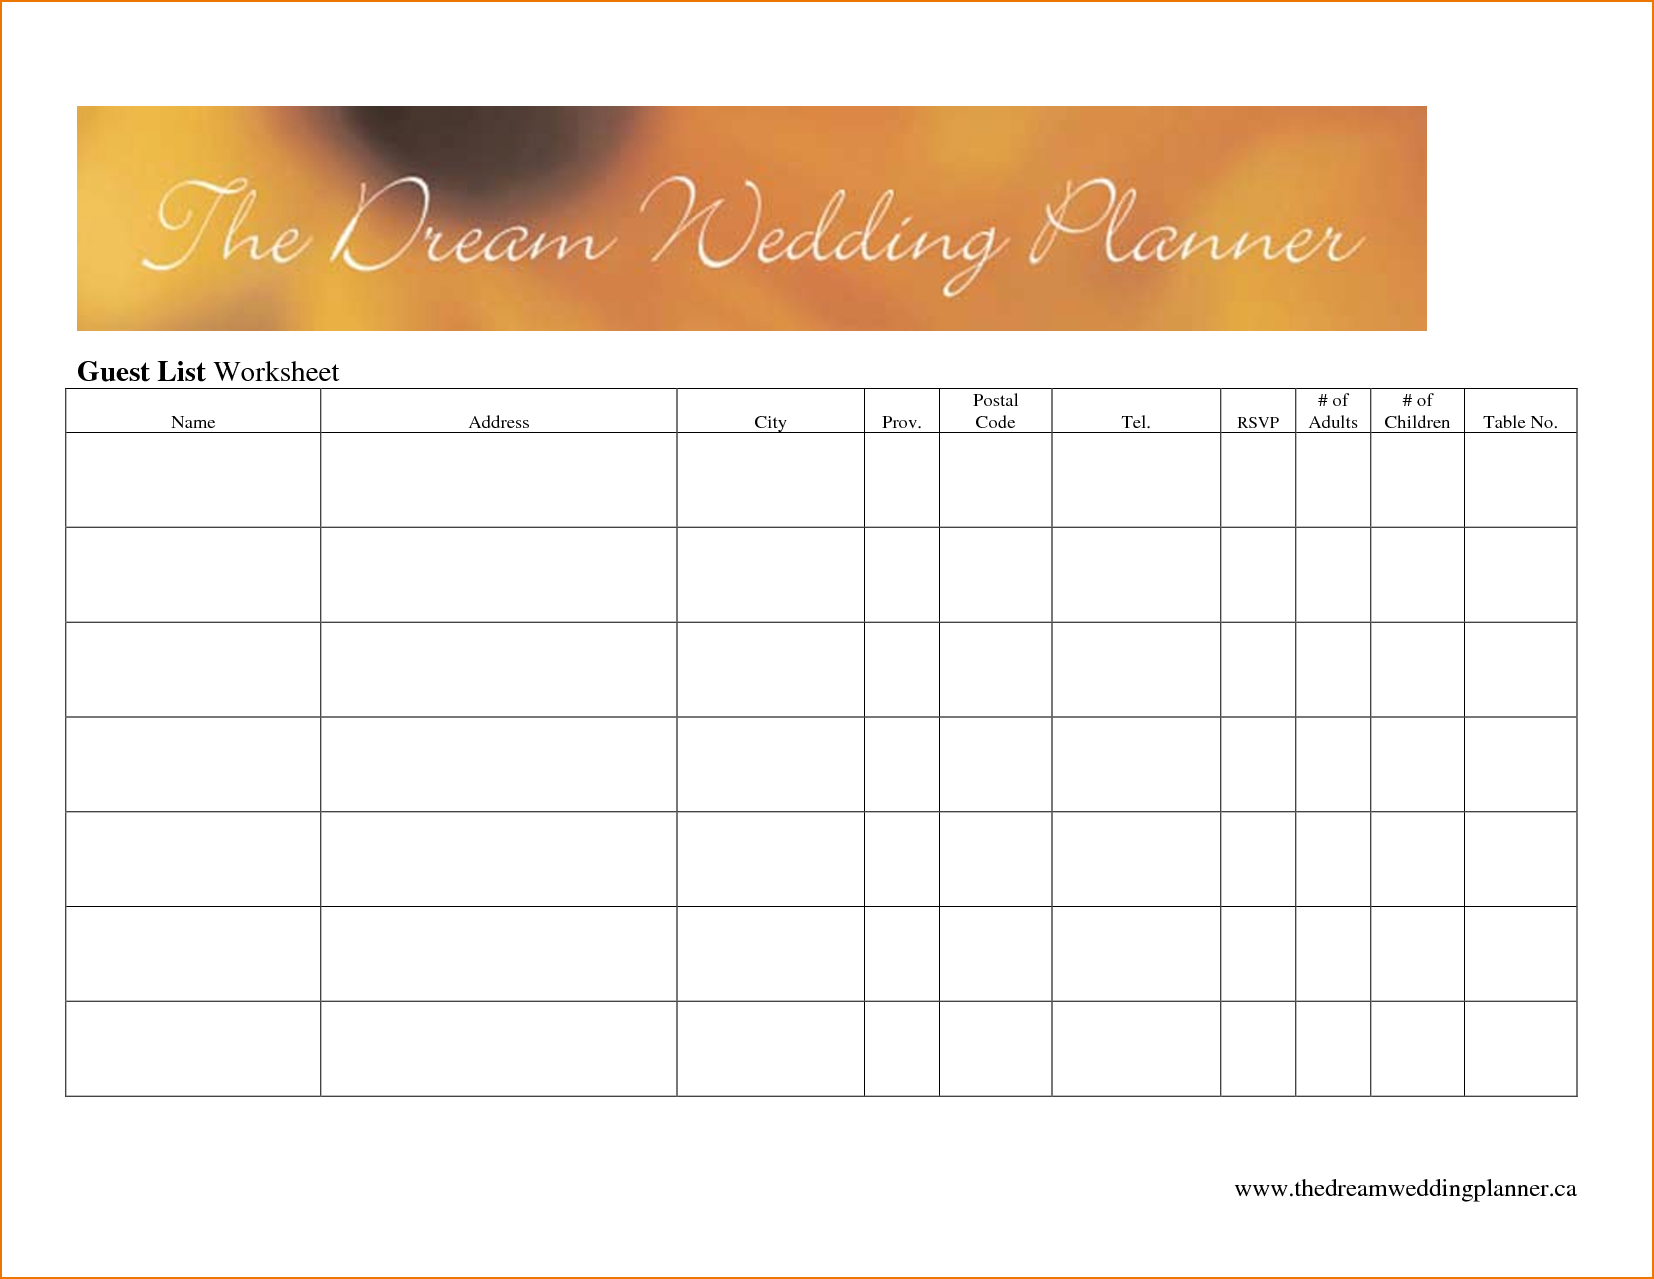 Sample Wedding Guest List Spreadsheet Throughout Wedding Guest List Worksheet  Kasare.annafora.co